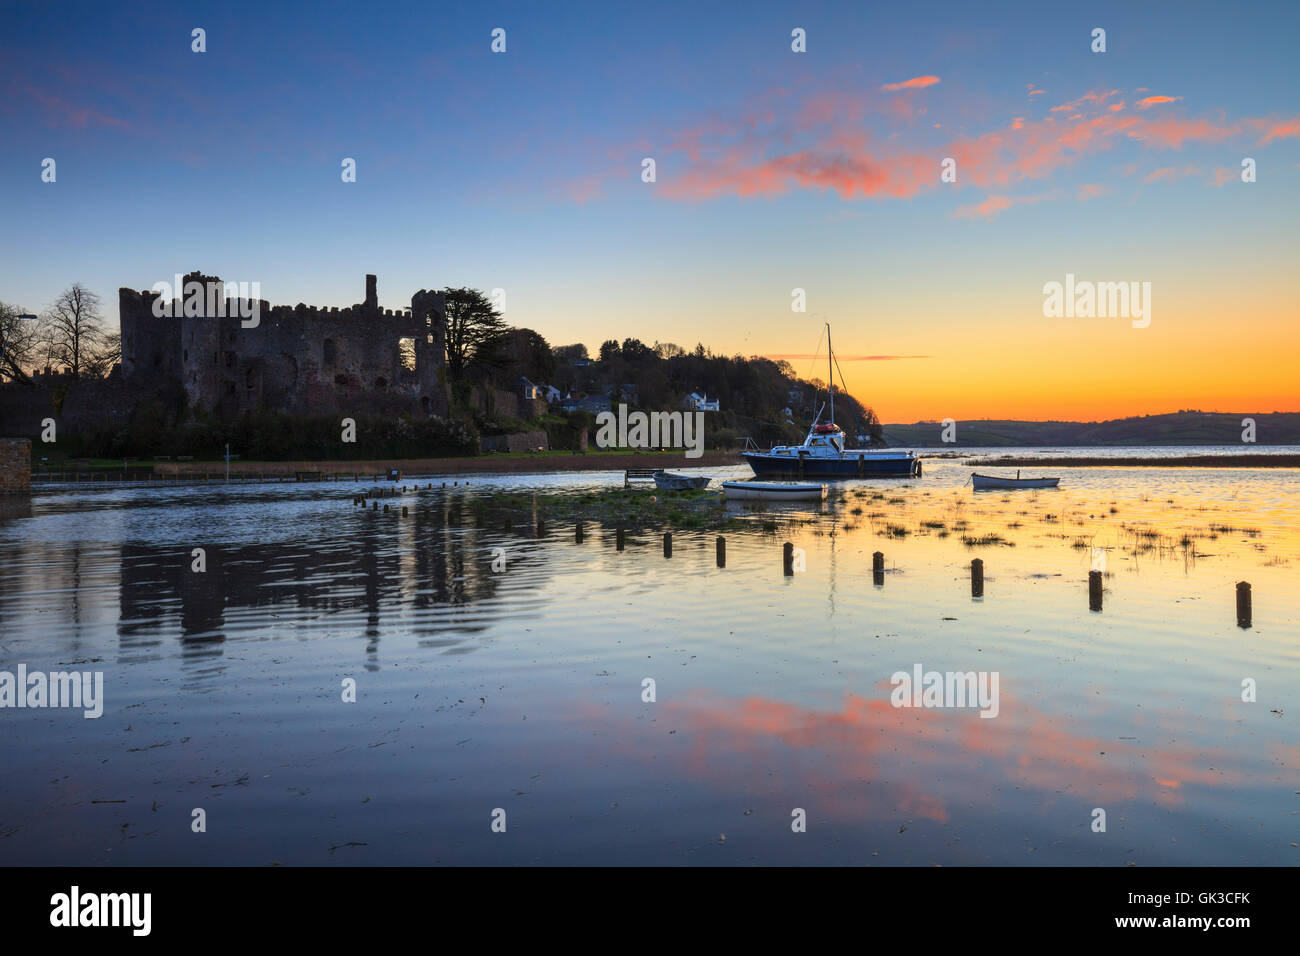 Laguarne Castle in Carmarthenshire captured at sunrise. - Stock Image